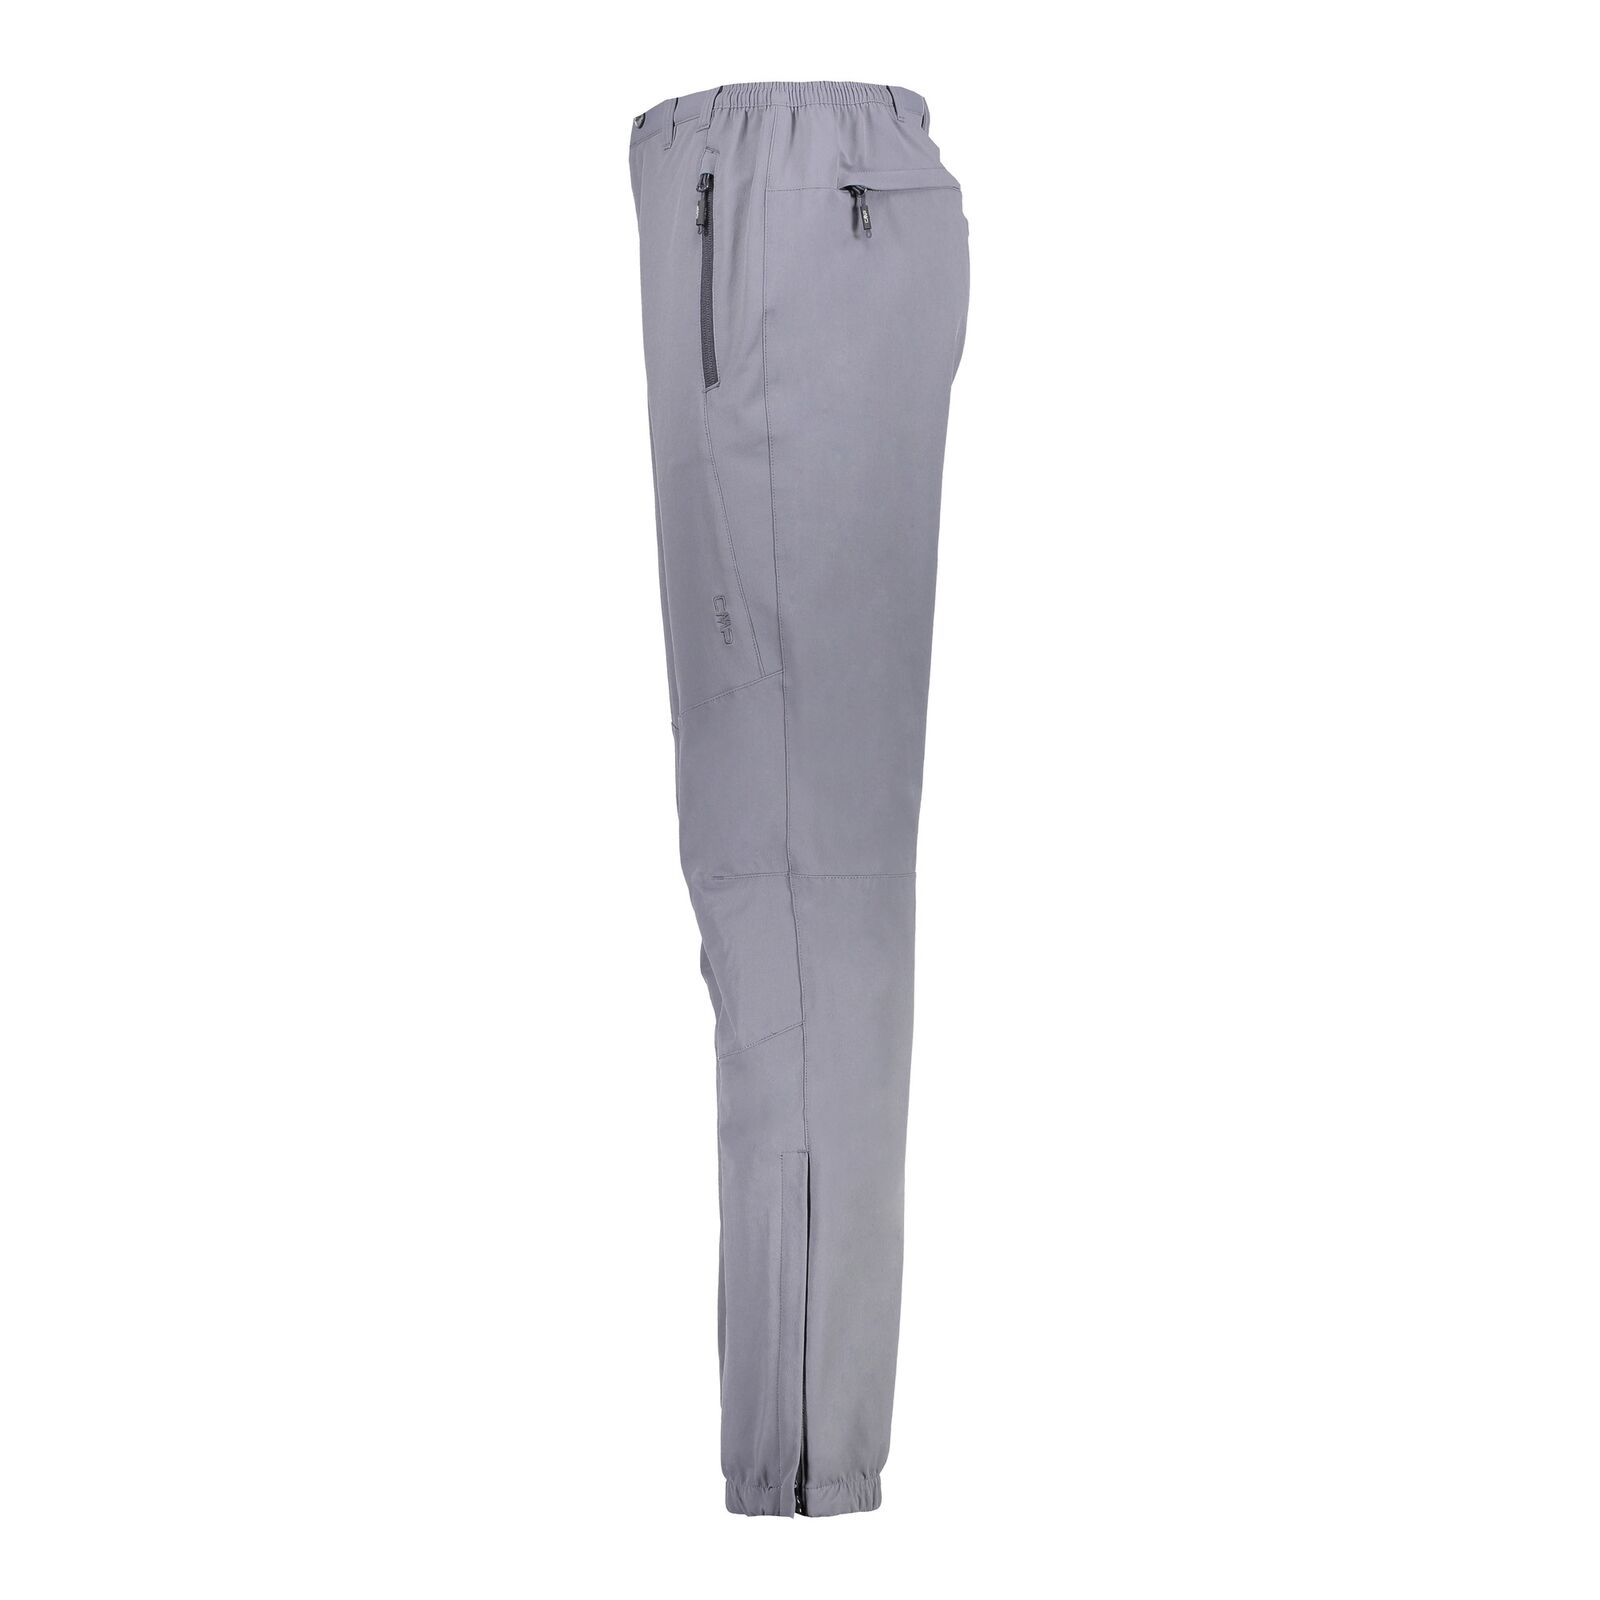 CMP Funktionshose Wanderhosen elastisch MAN LONG PANT grau elastisch Wanderhosen UV-Schutz 11c442